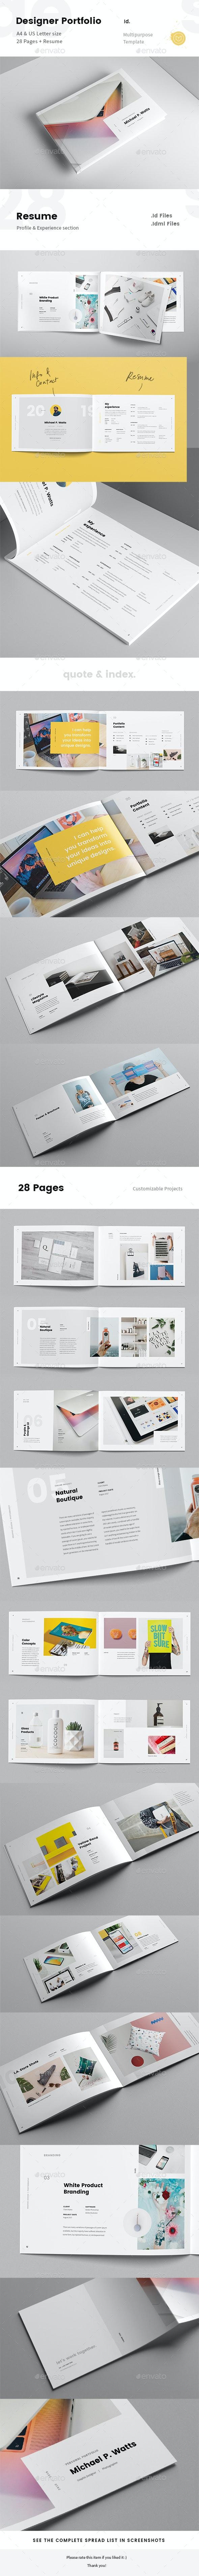 Landscape Creative Portfolio for Designers with Resume - Portfolio Brochures